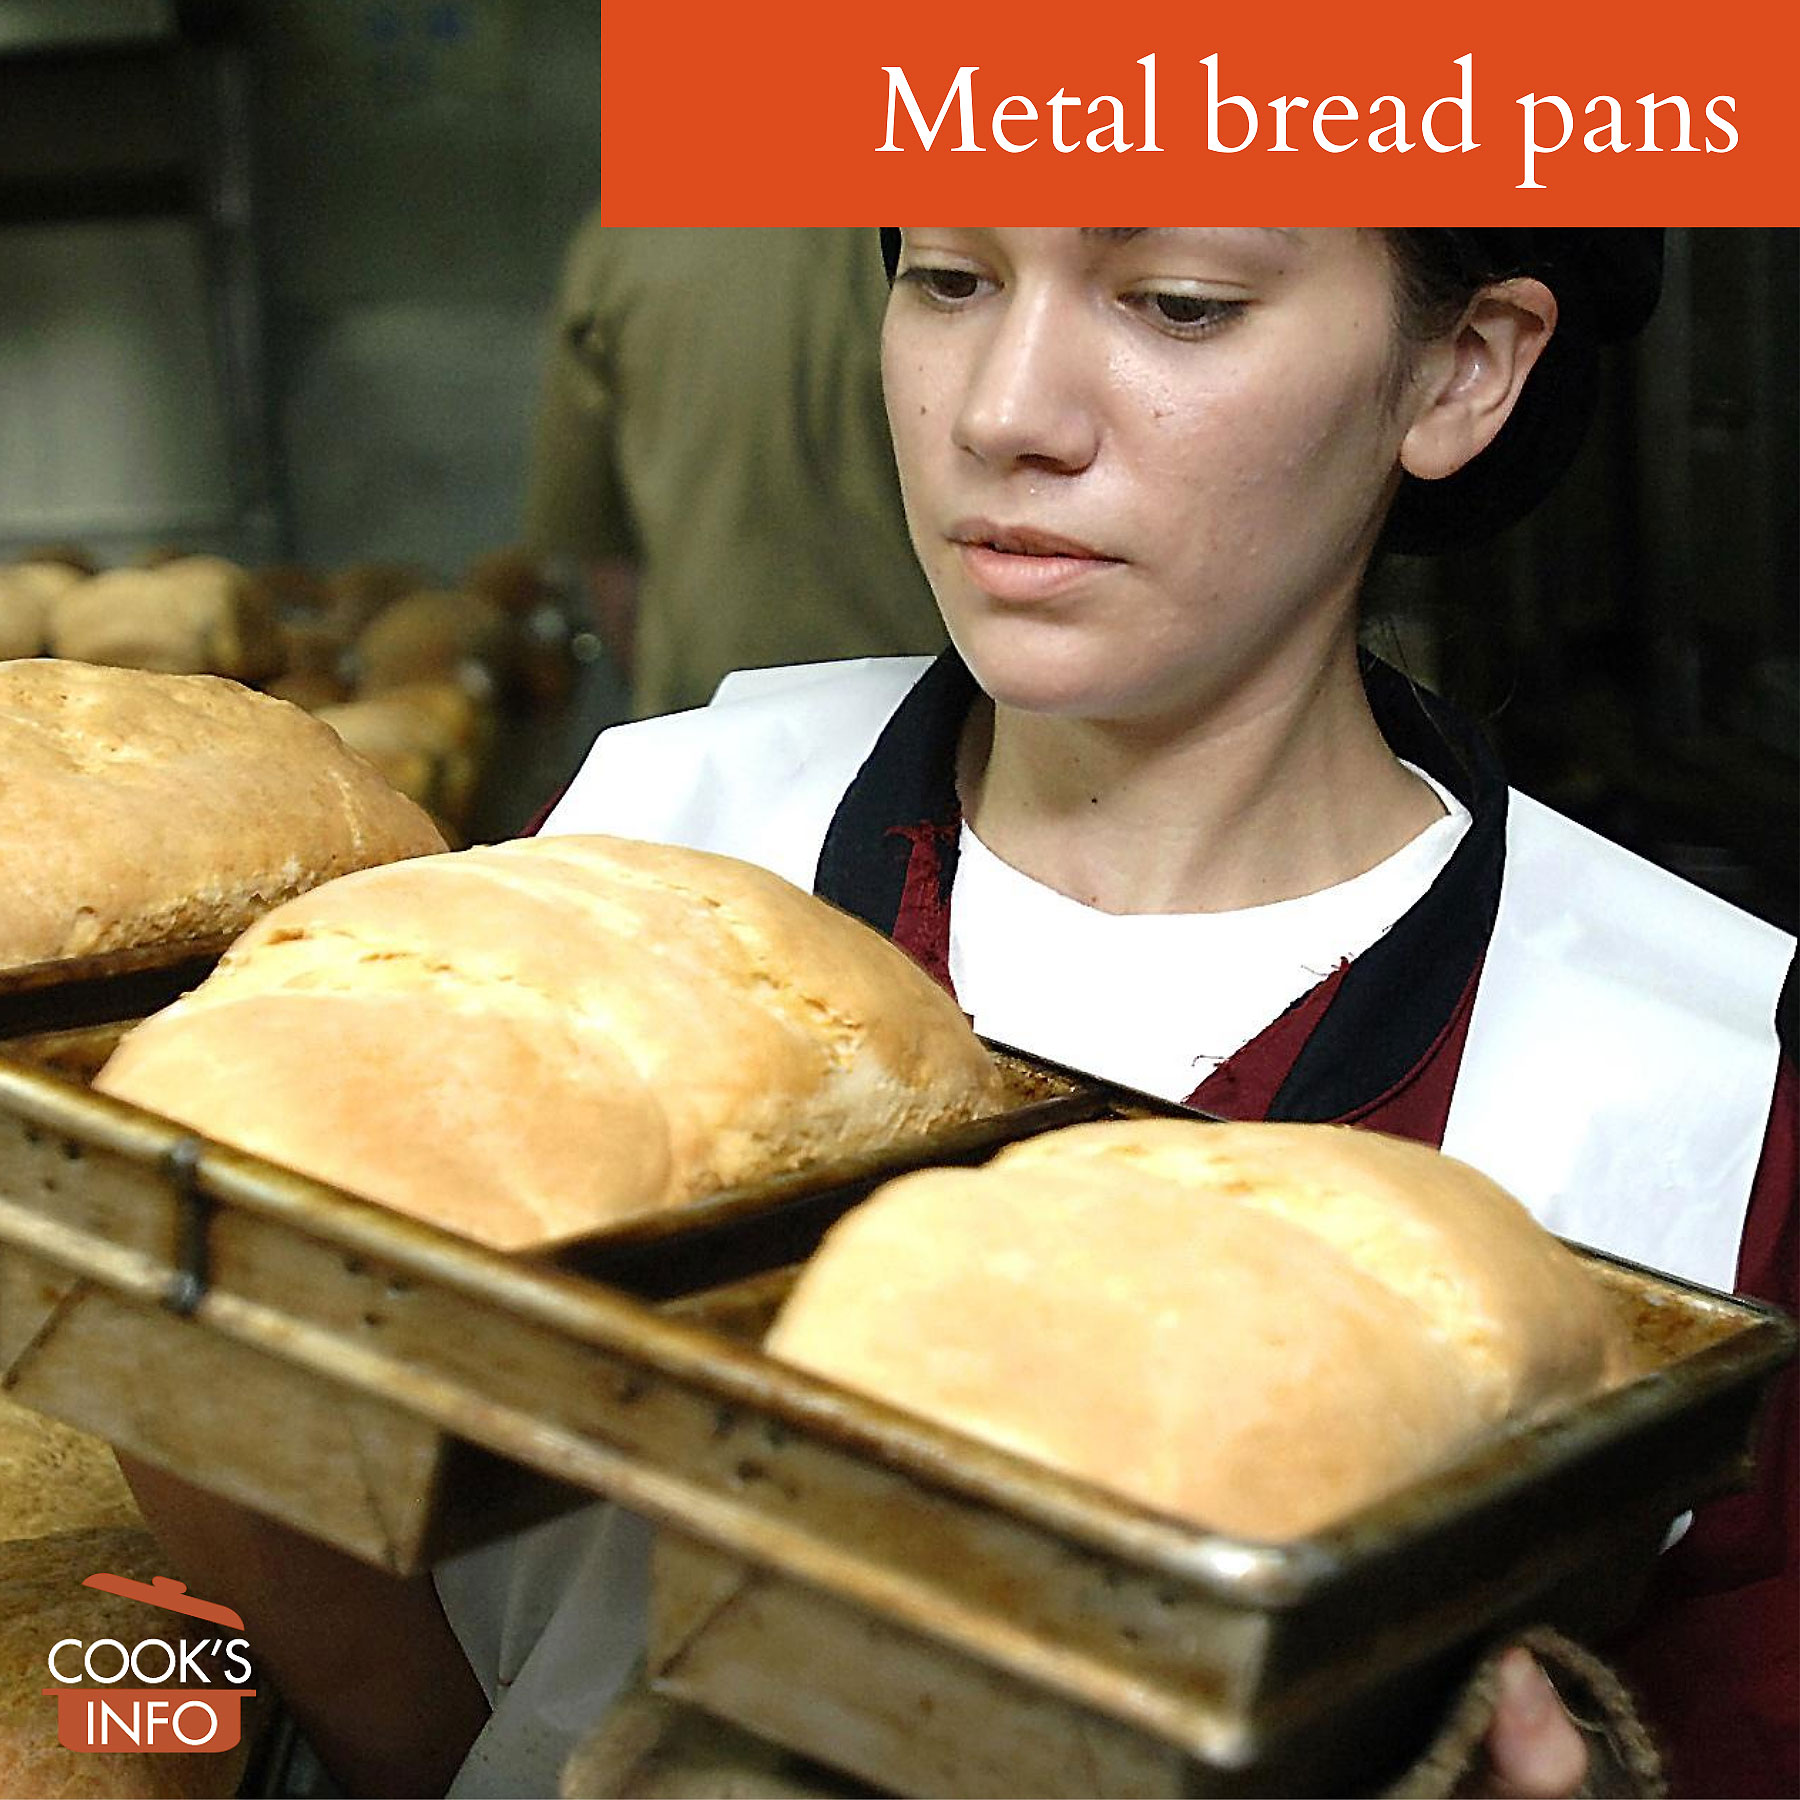 Baker's bread pans